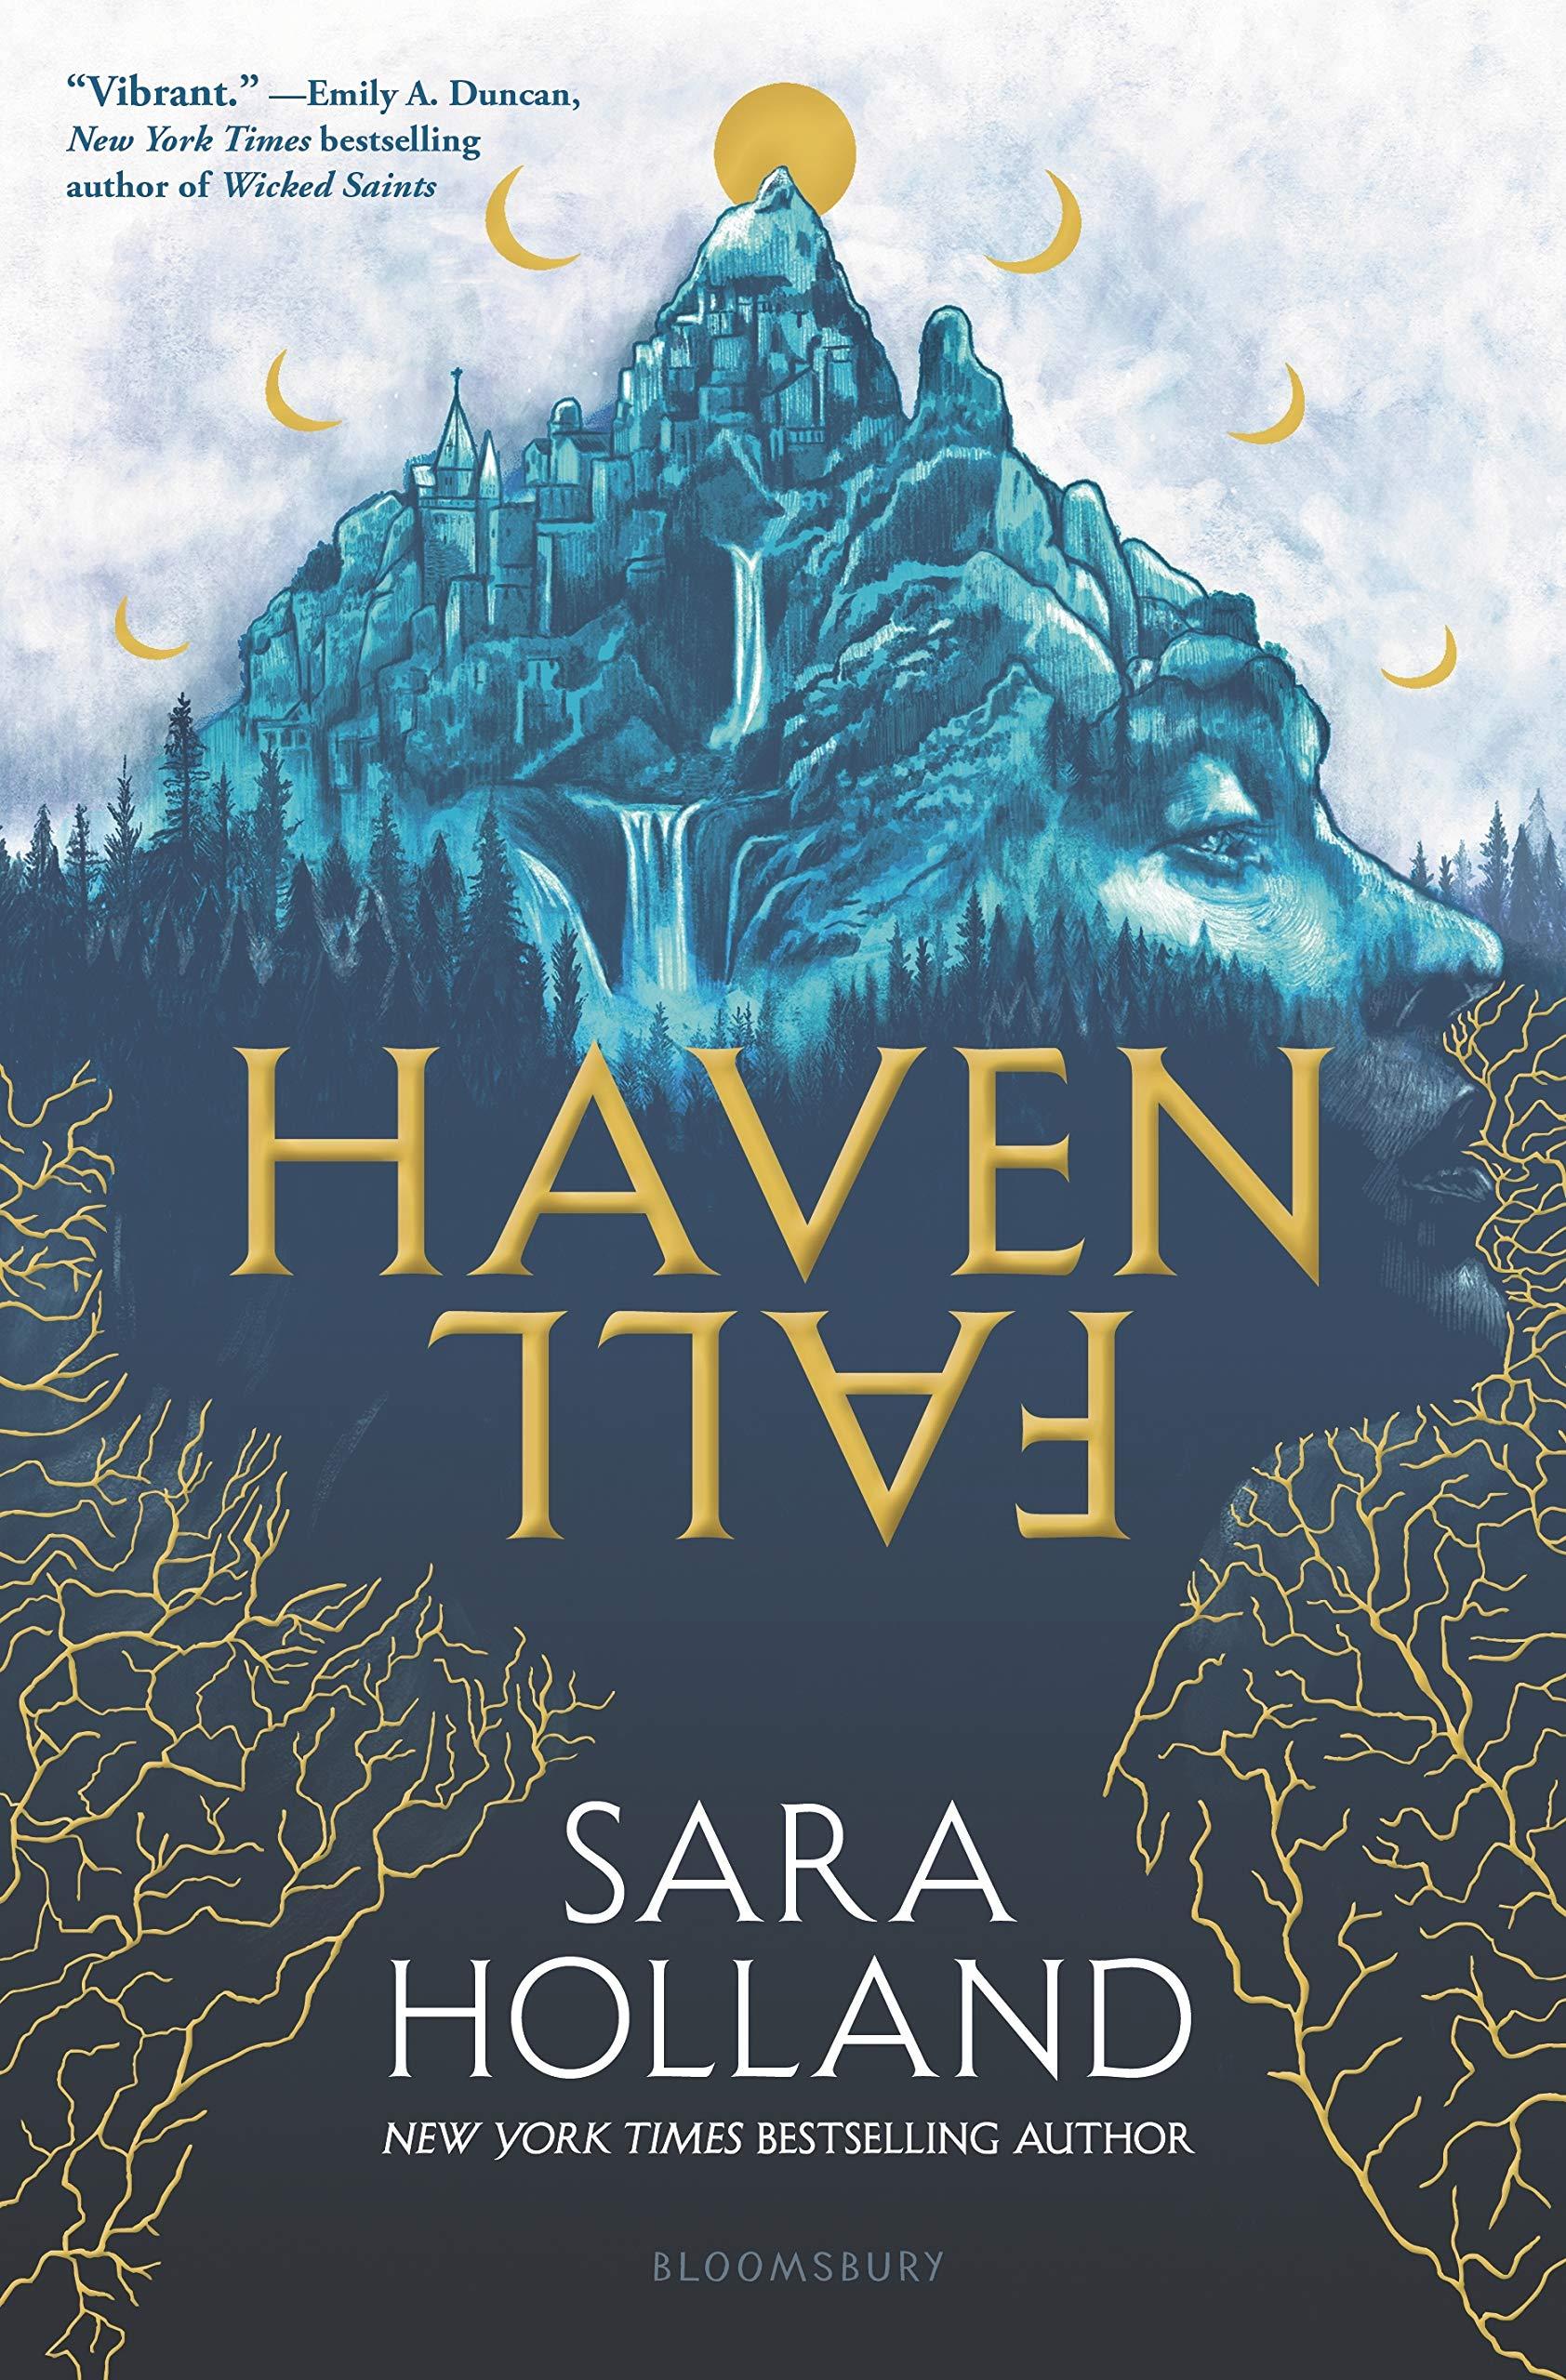 Amazon.com: Havenfall (9781547603794): Holland, Sara: Books